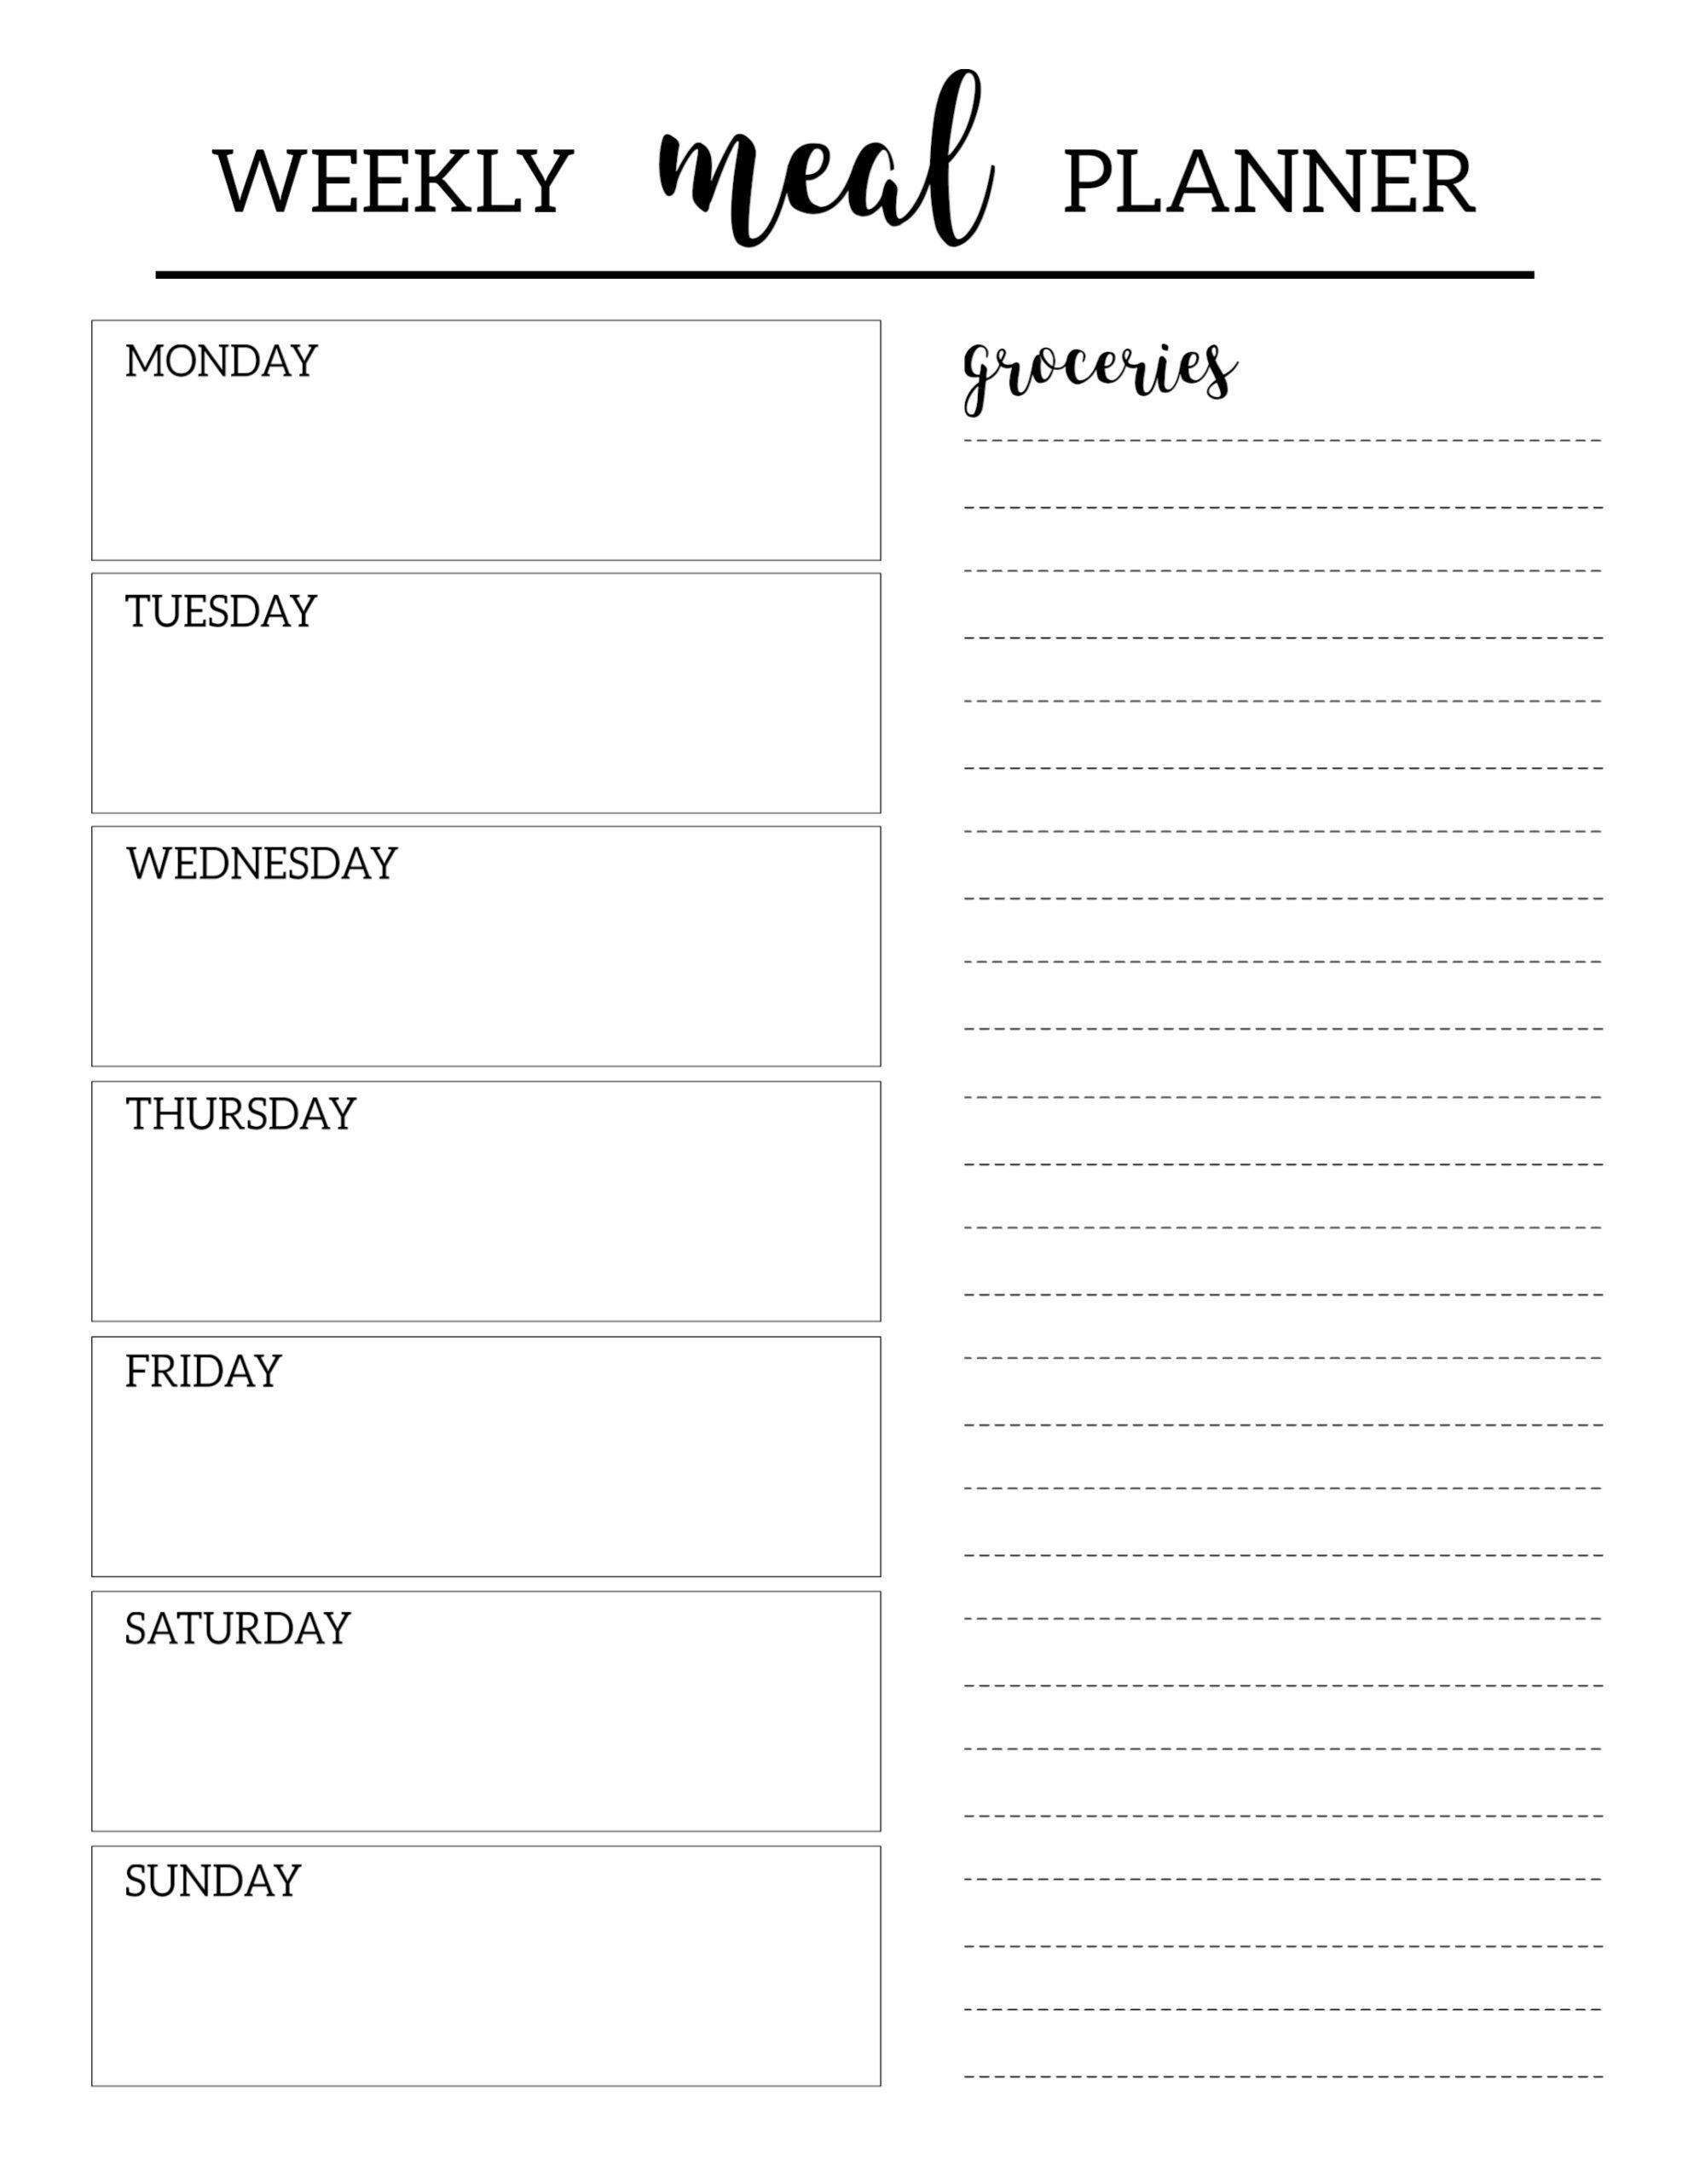 006 Rare Meal Plan Calendar Template Inspiration  Excel Weekly 30 DayFull